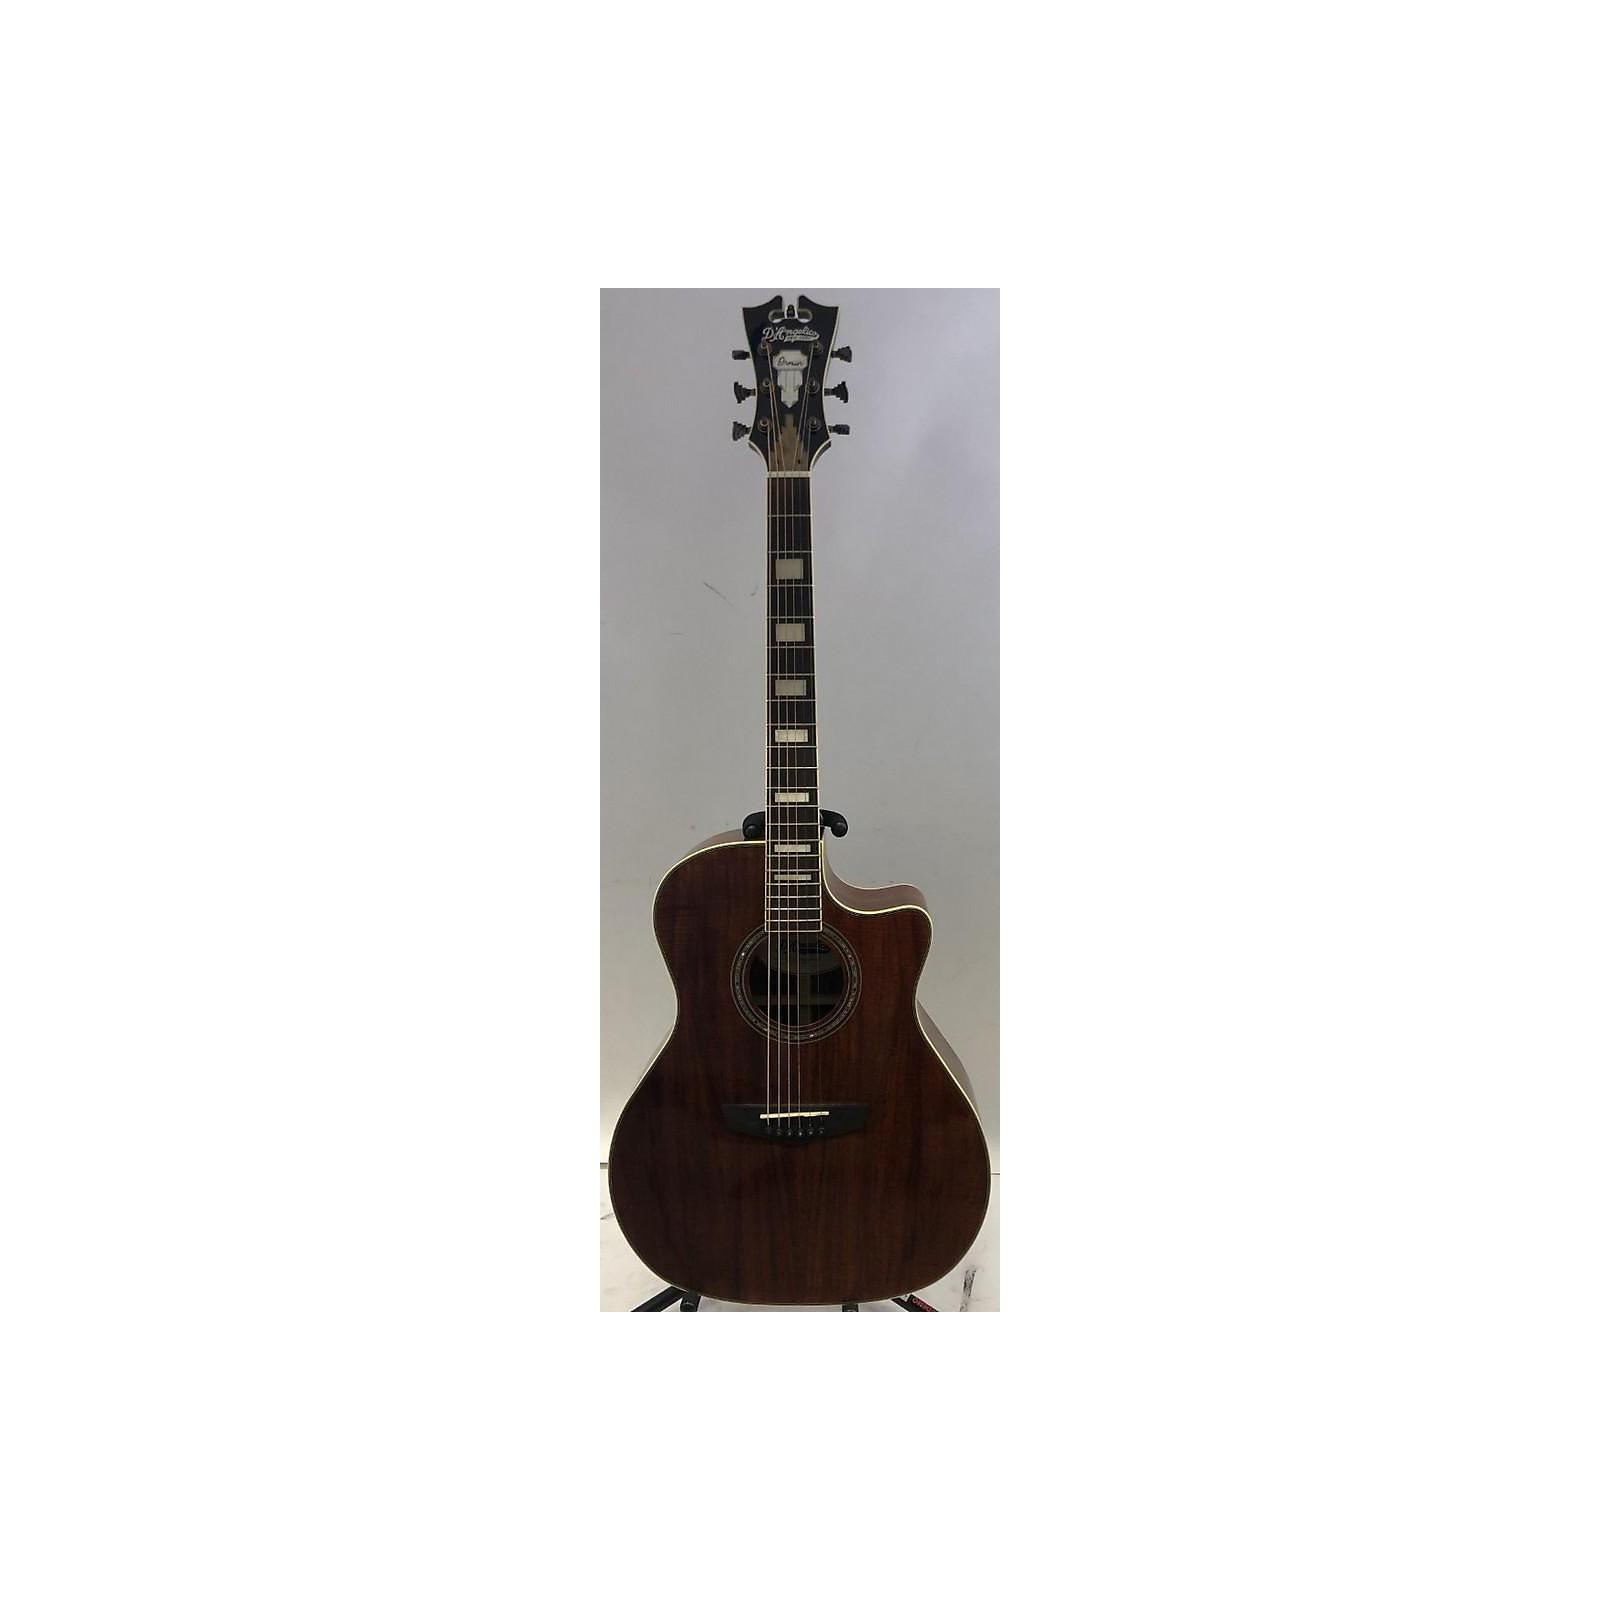 D'Angelico PREMIER GRAMERCY KOA Acoustic Electric Guitar